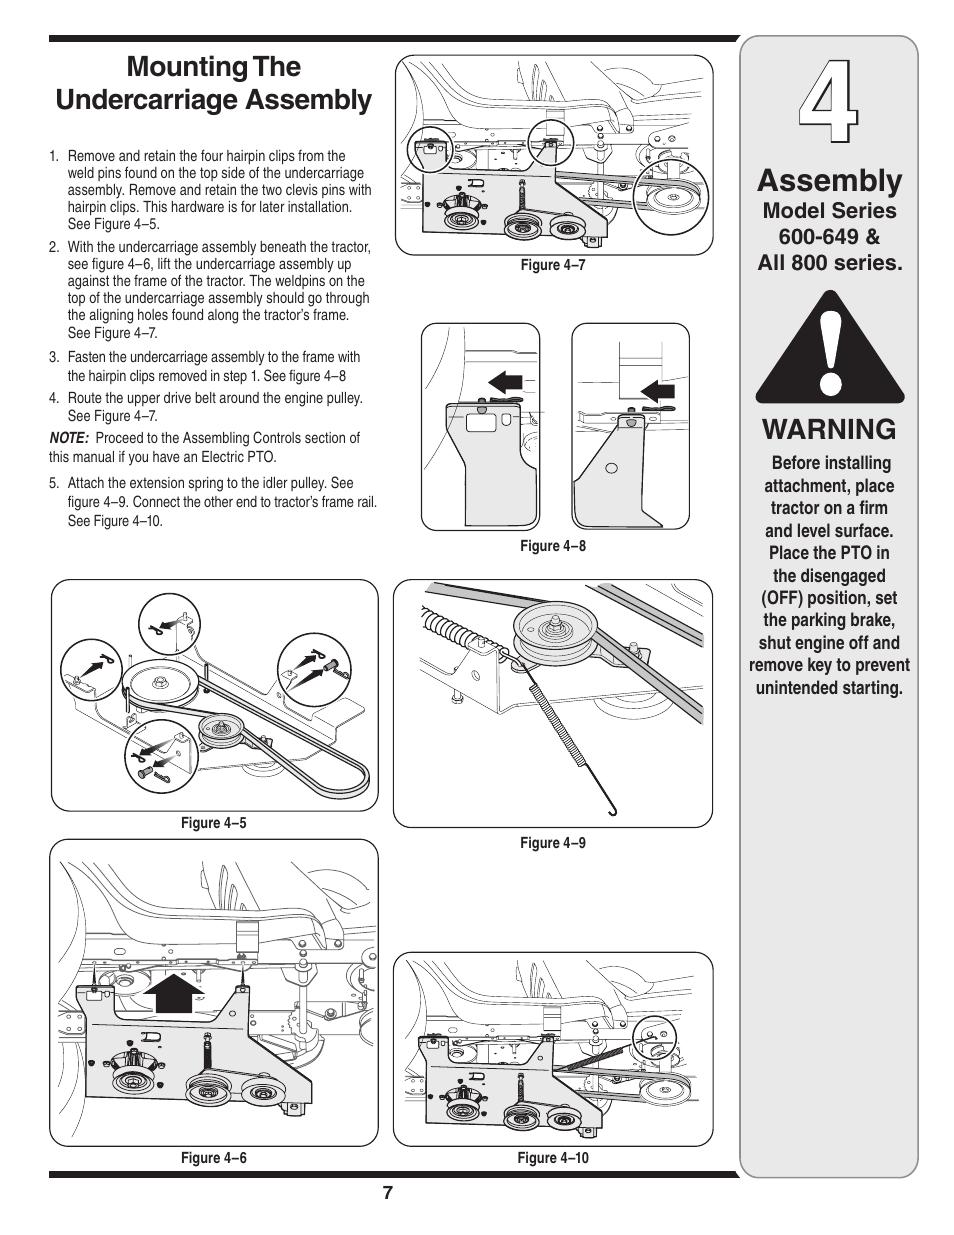 medium resolution of  array assembly warning mounting the undercarriage assembly mtd 190 032 rh manualsdir com